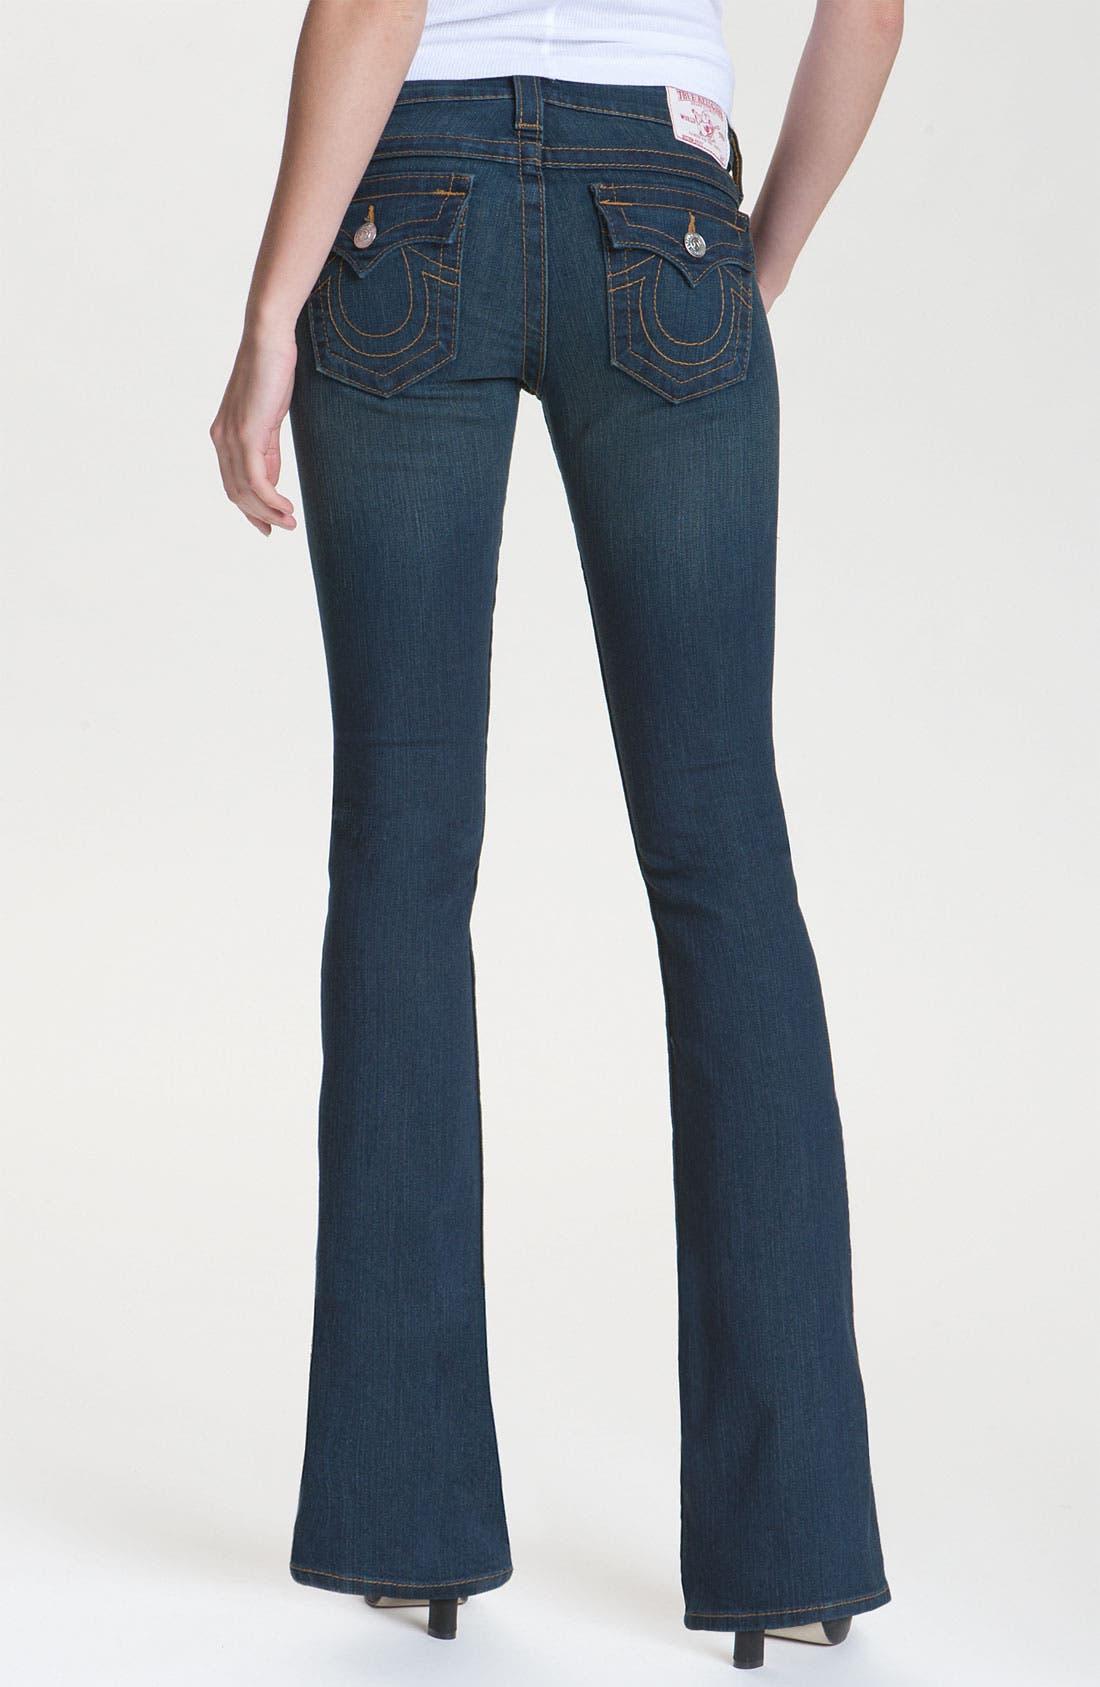 Alternate Image 2  - True Religion Brand Jeans 'Becky' Bootcut Jeans (Vera Cruz) (Petite)